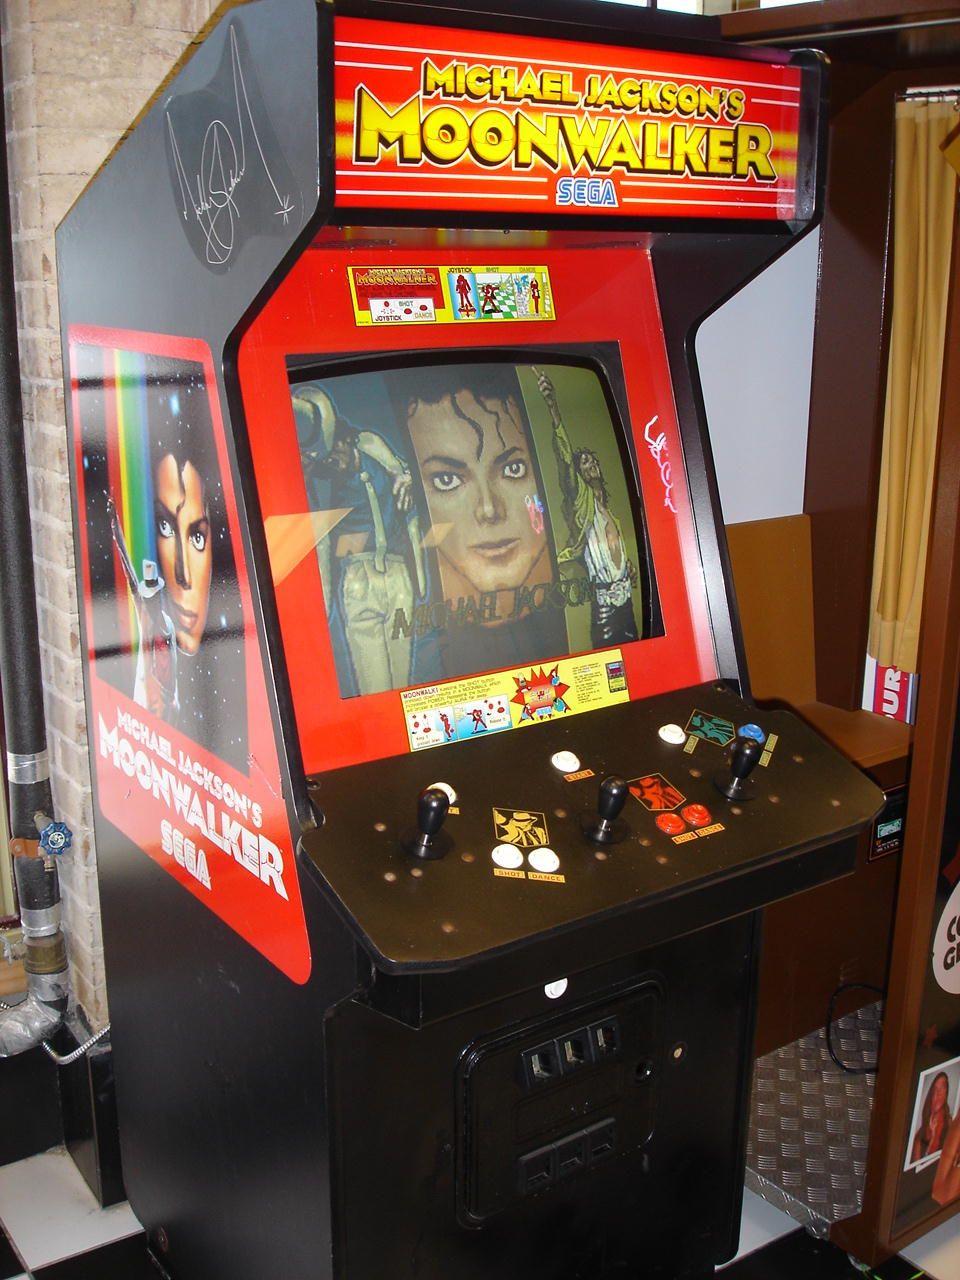 Michael Jackson's Moonwalker Arcade (1990)